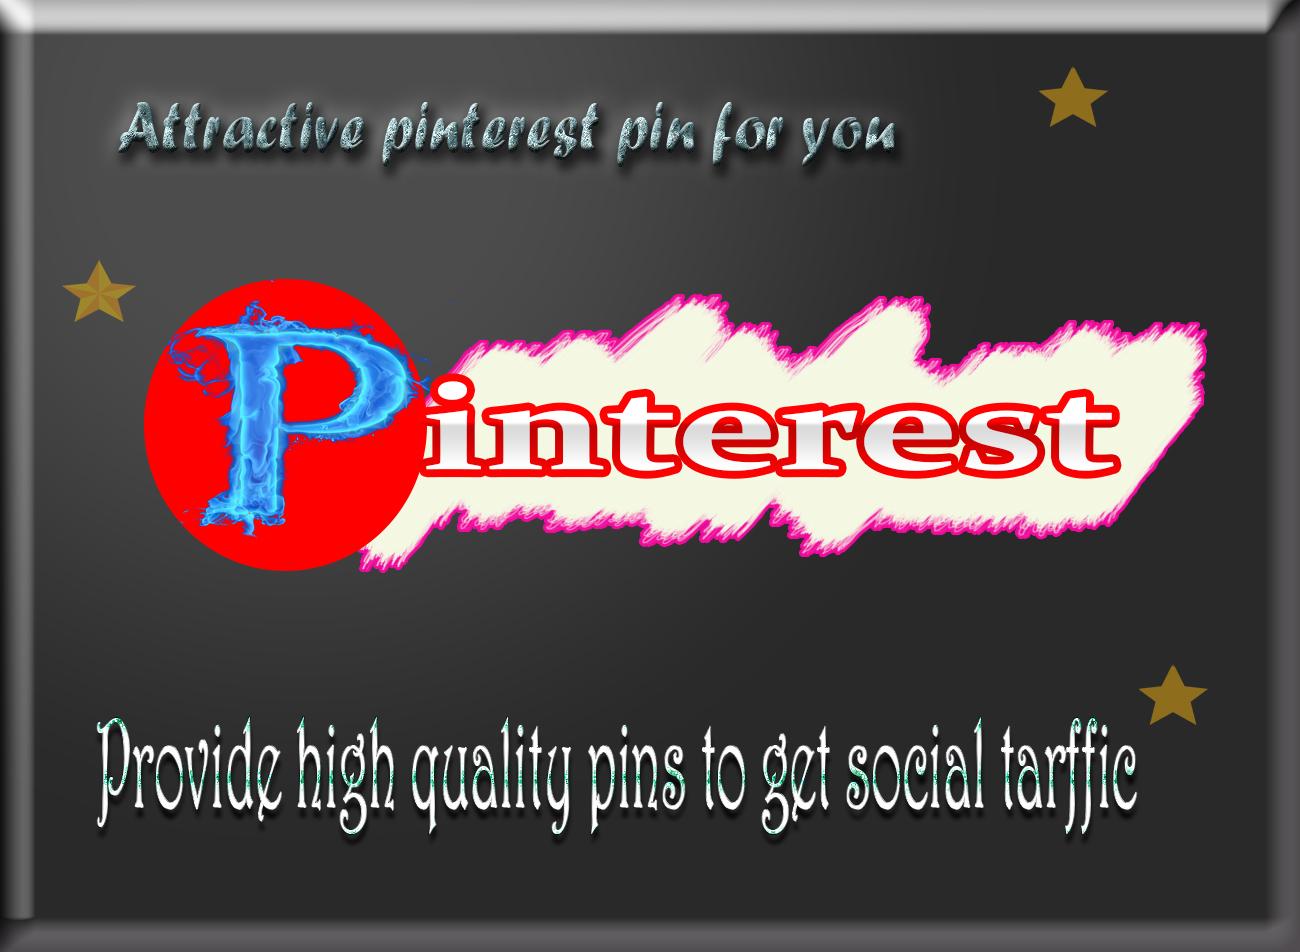 Get wonderful Pinterest pins for targeted market